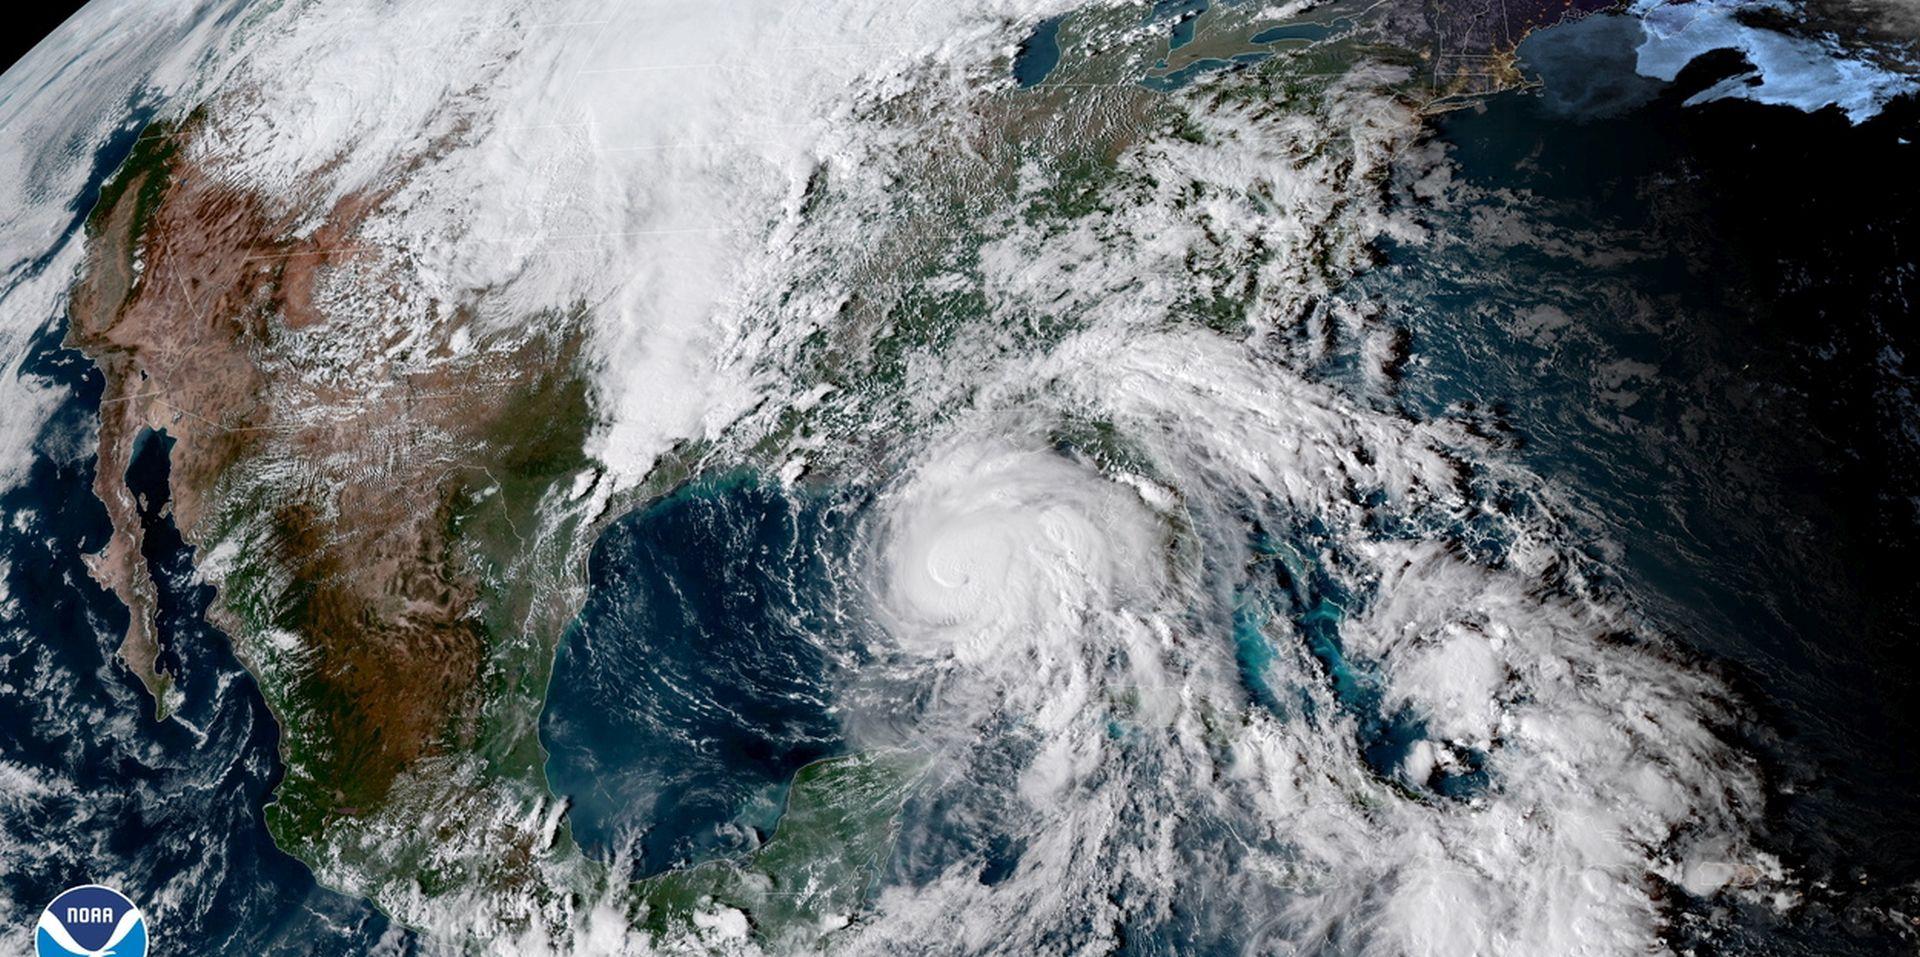 Uragan Barry približava se obali Louisiane